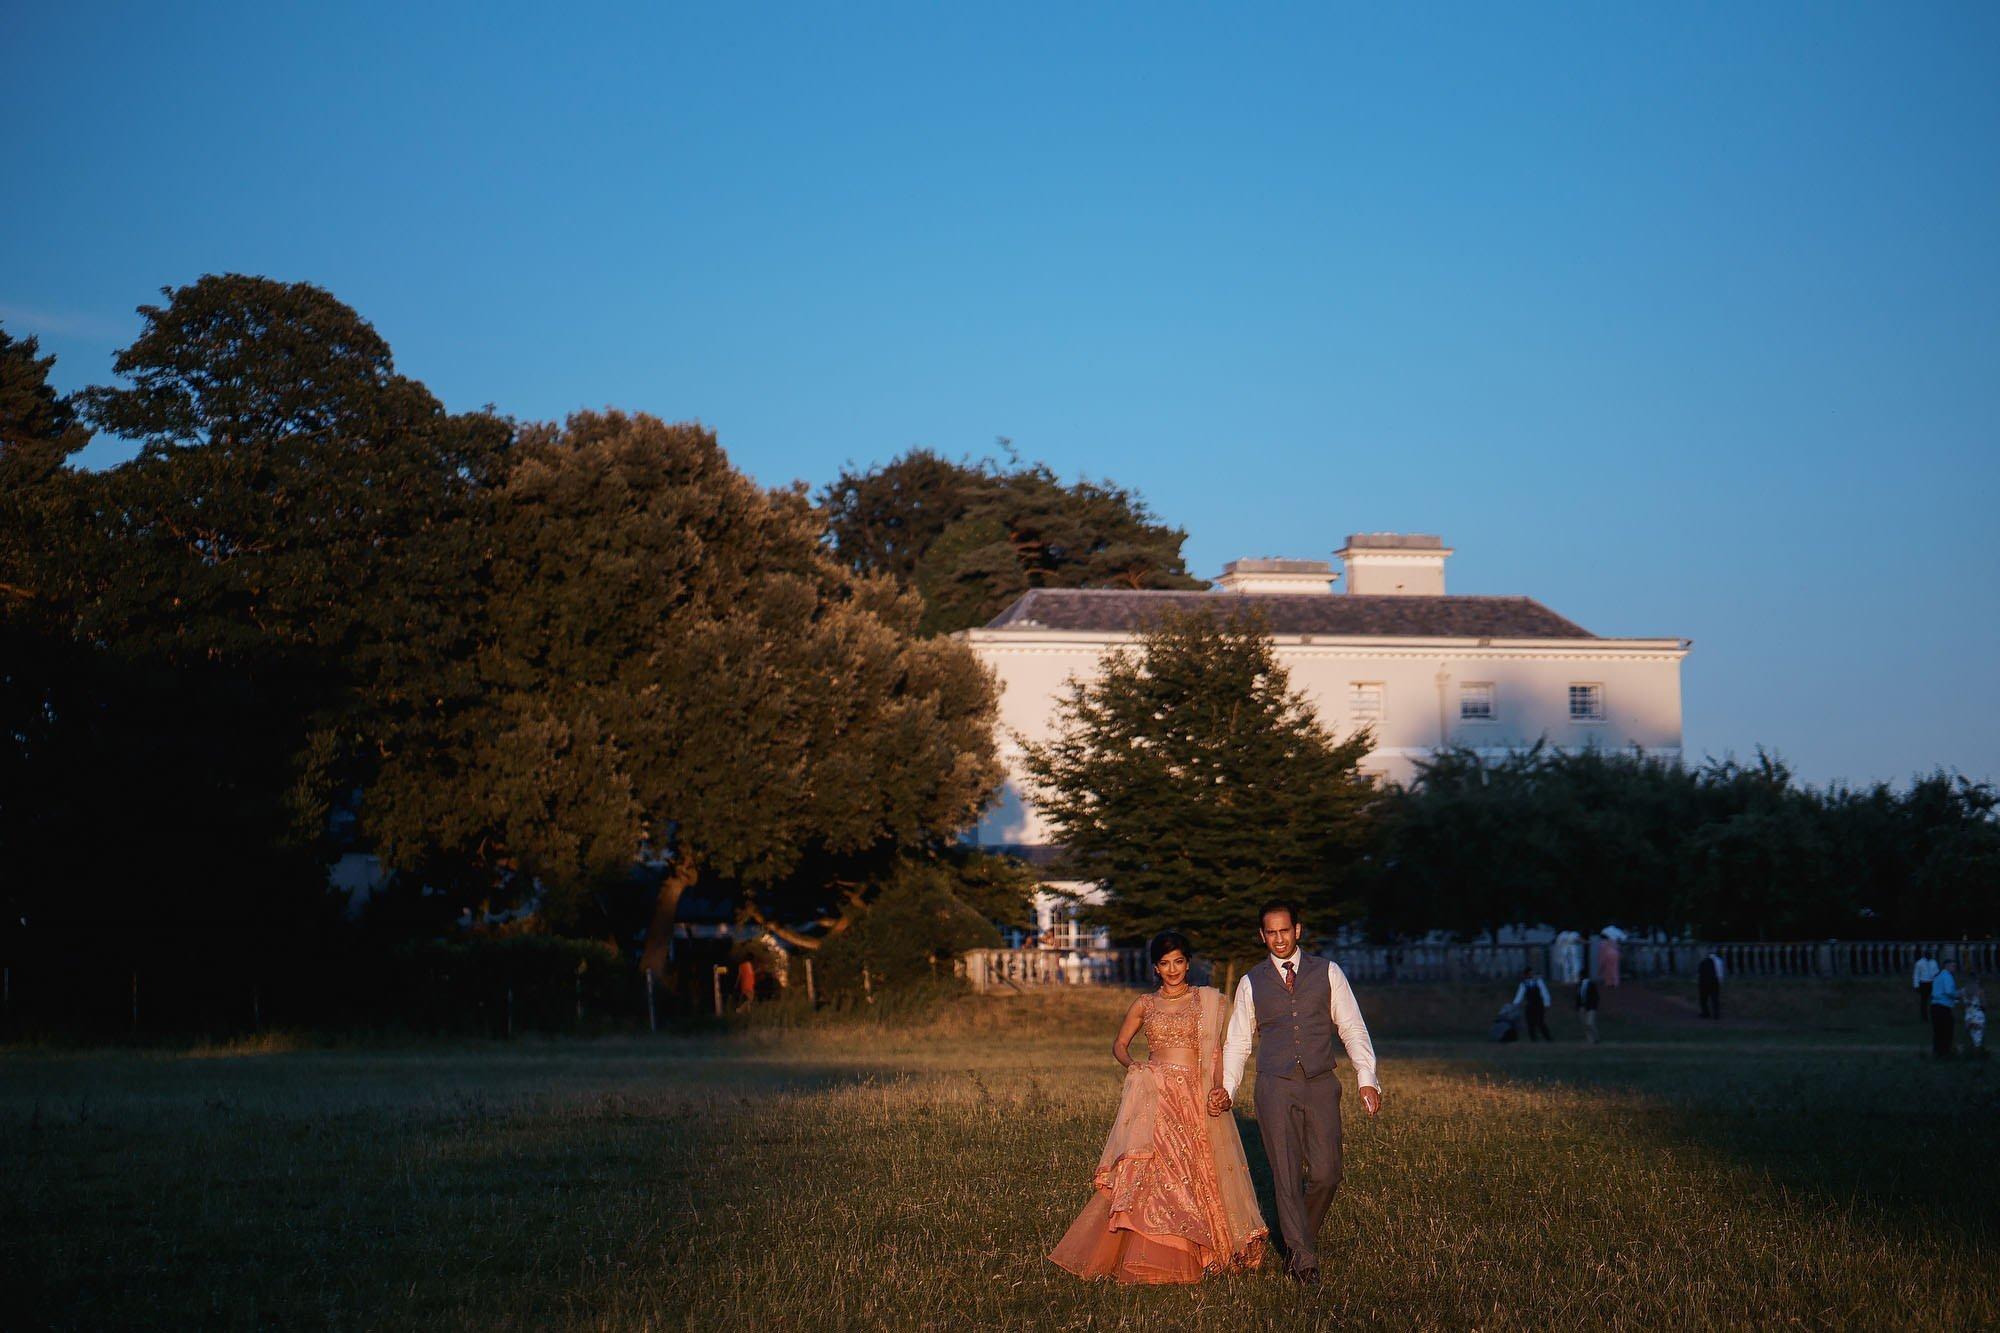 Bridwell Park Devon Weddings - Wedding Photography at Bridwell Park by ARJ Photography